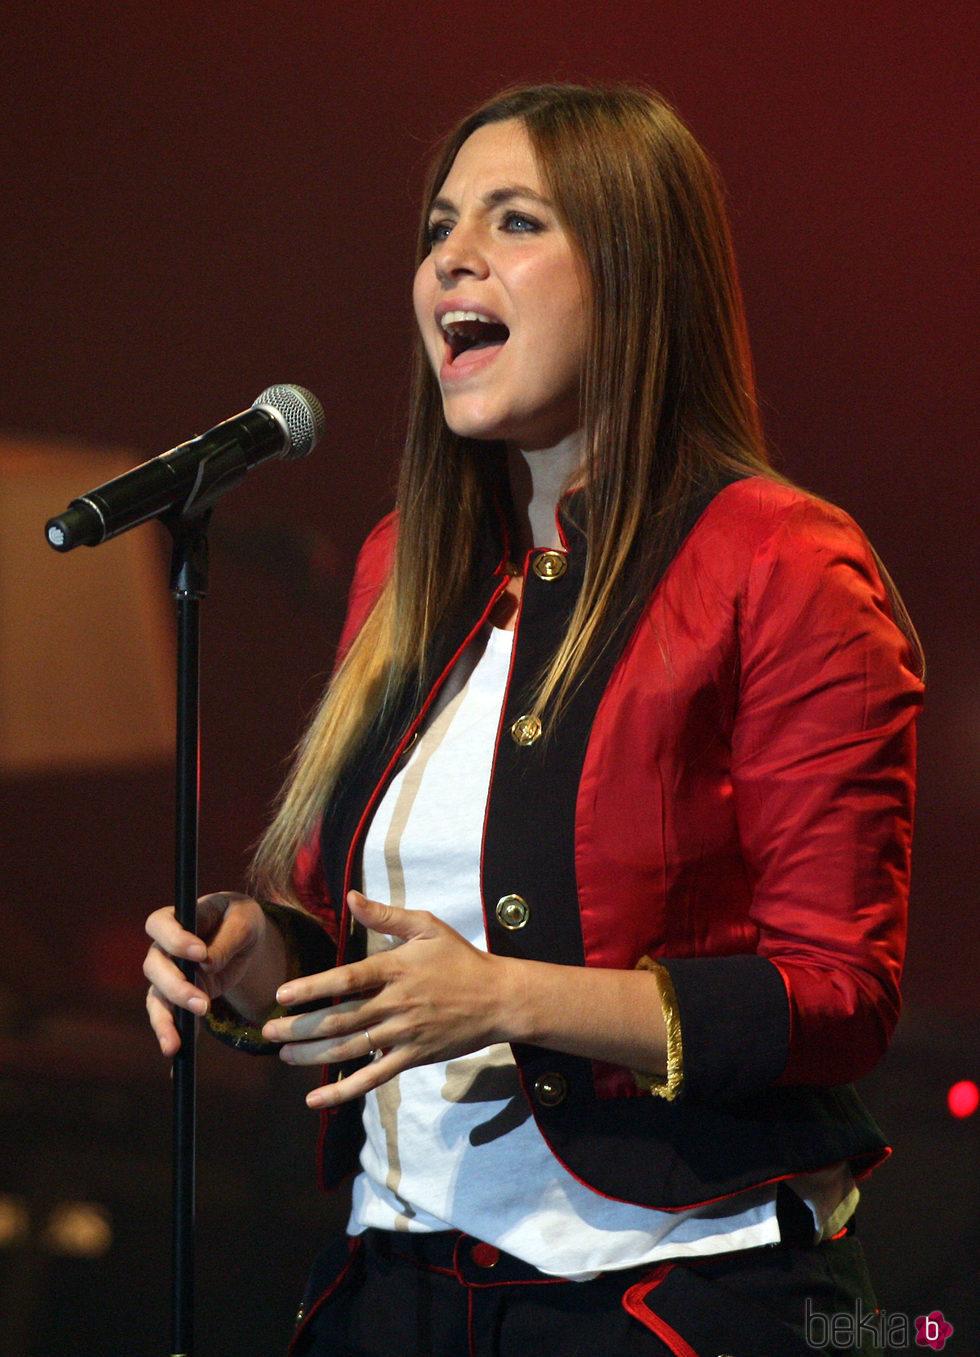 Leire Martínez cantando con el cabello liso